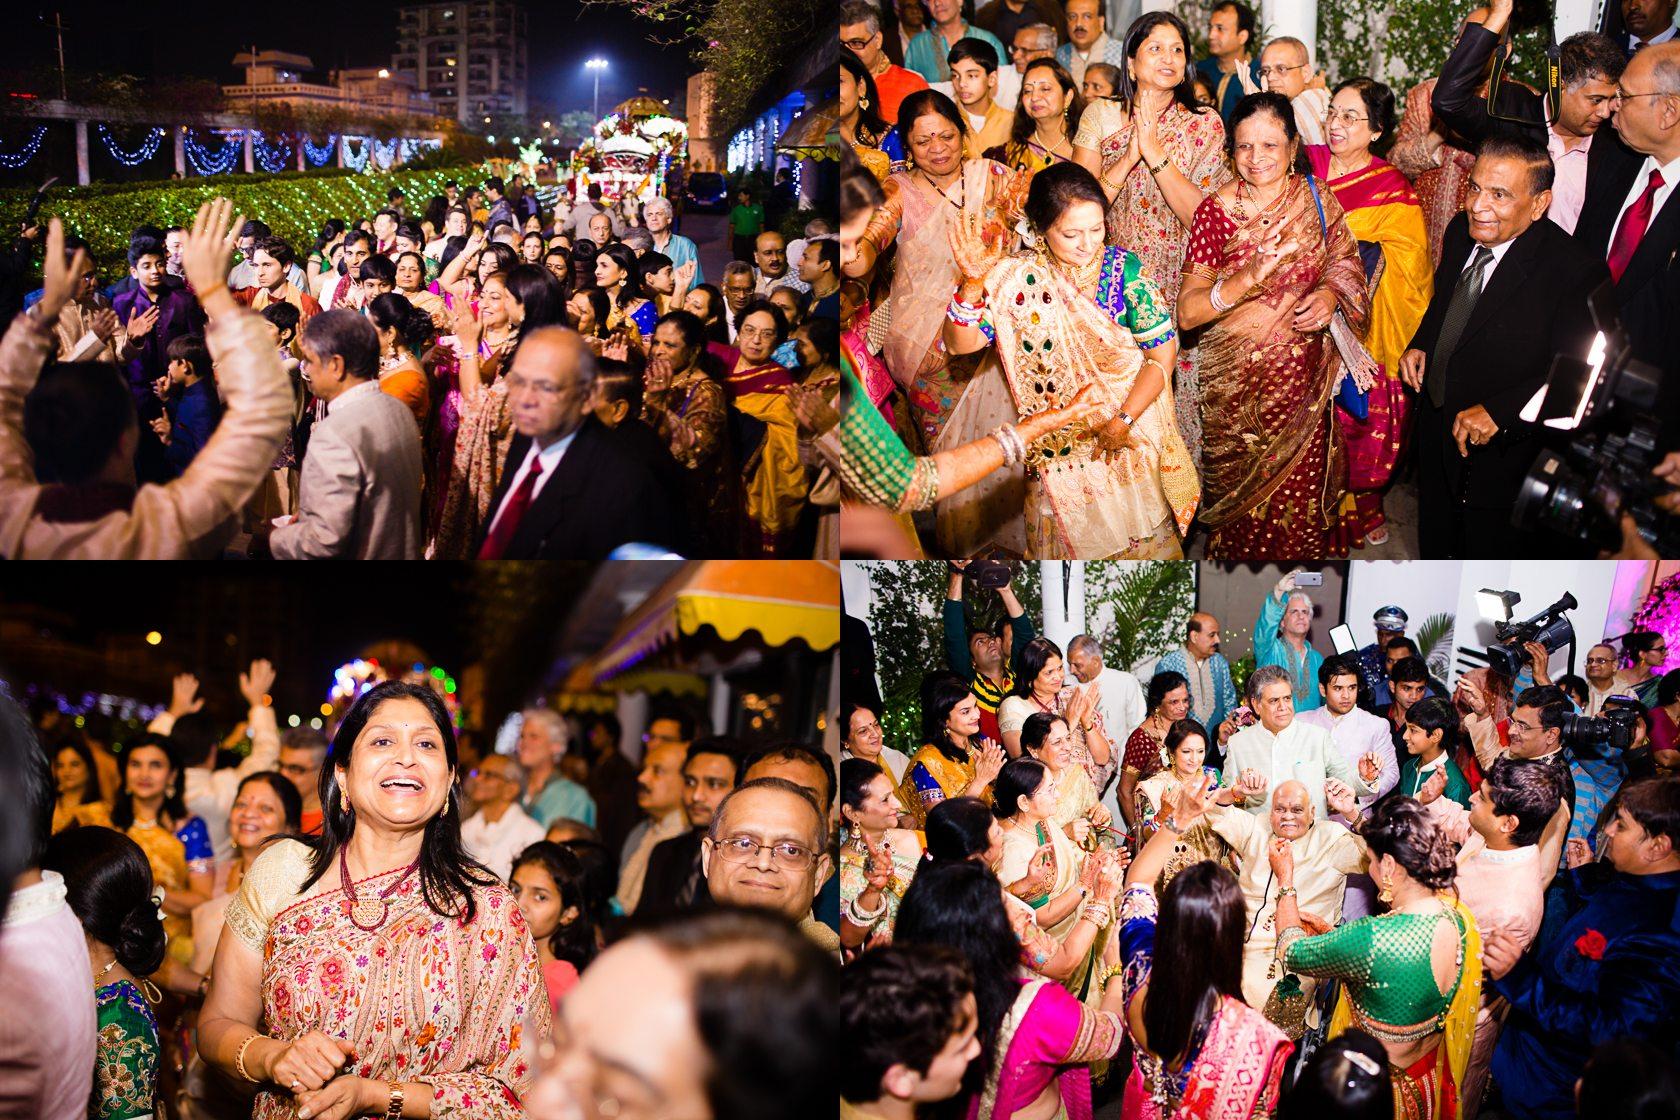 India_Wedding_126.jpg